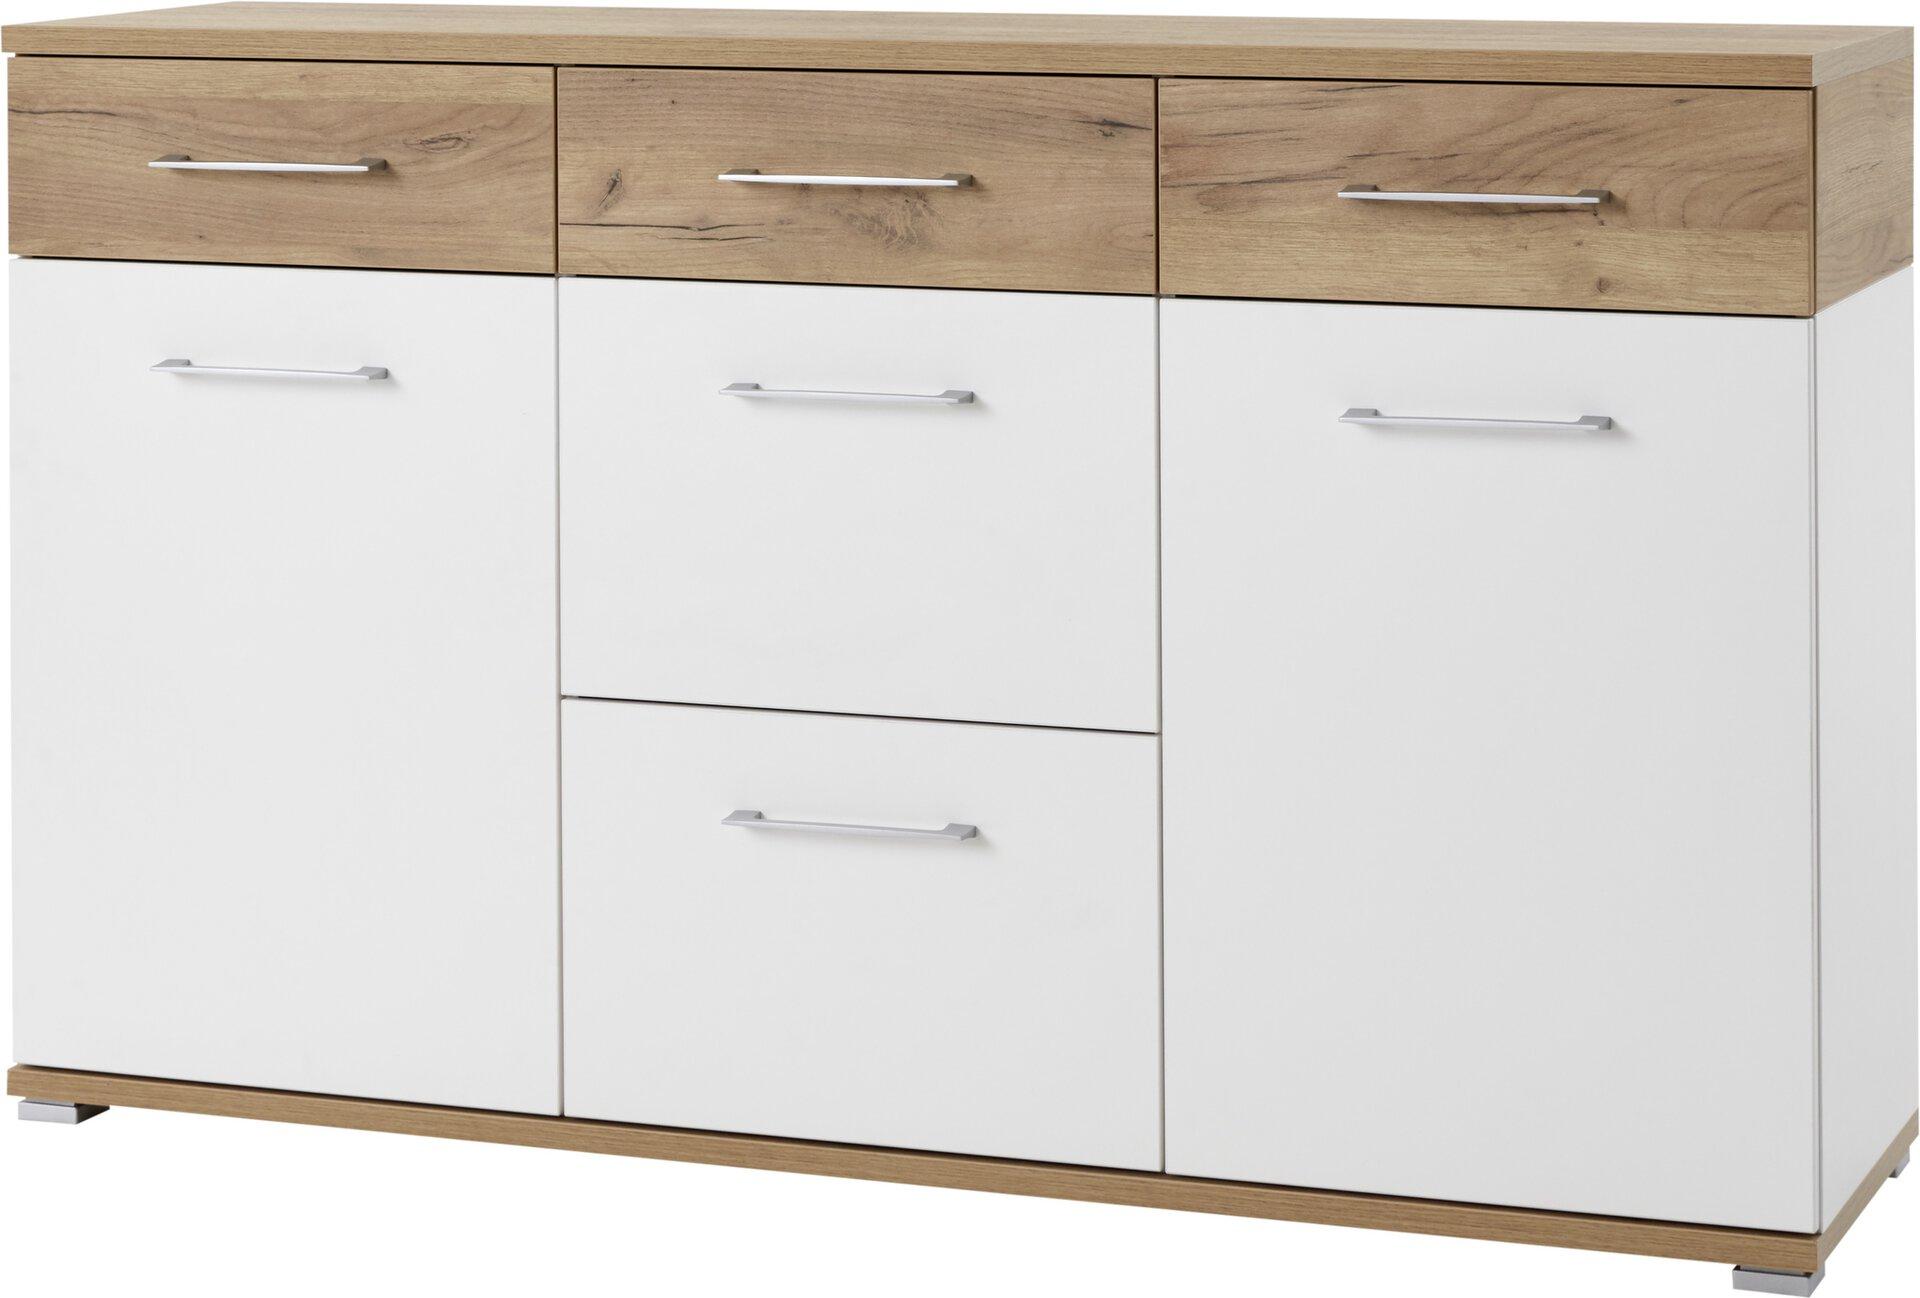 Kommode TOPIX Germania Holzwerkstoff mehrfarbig 40 x 87 x 144 cm